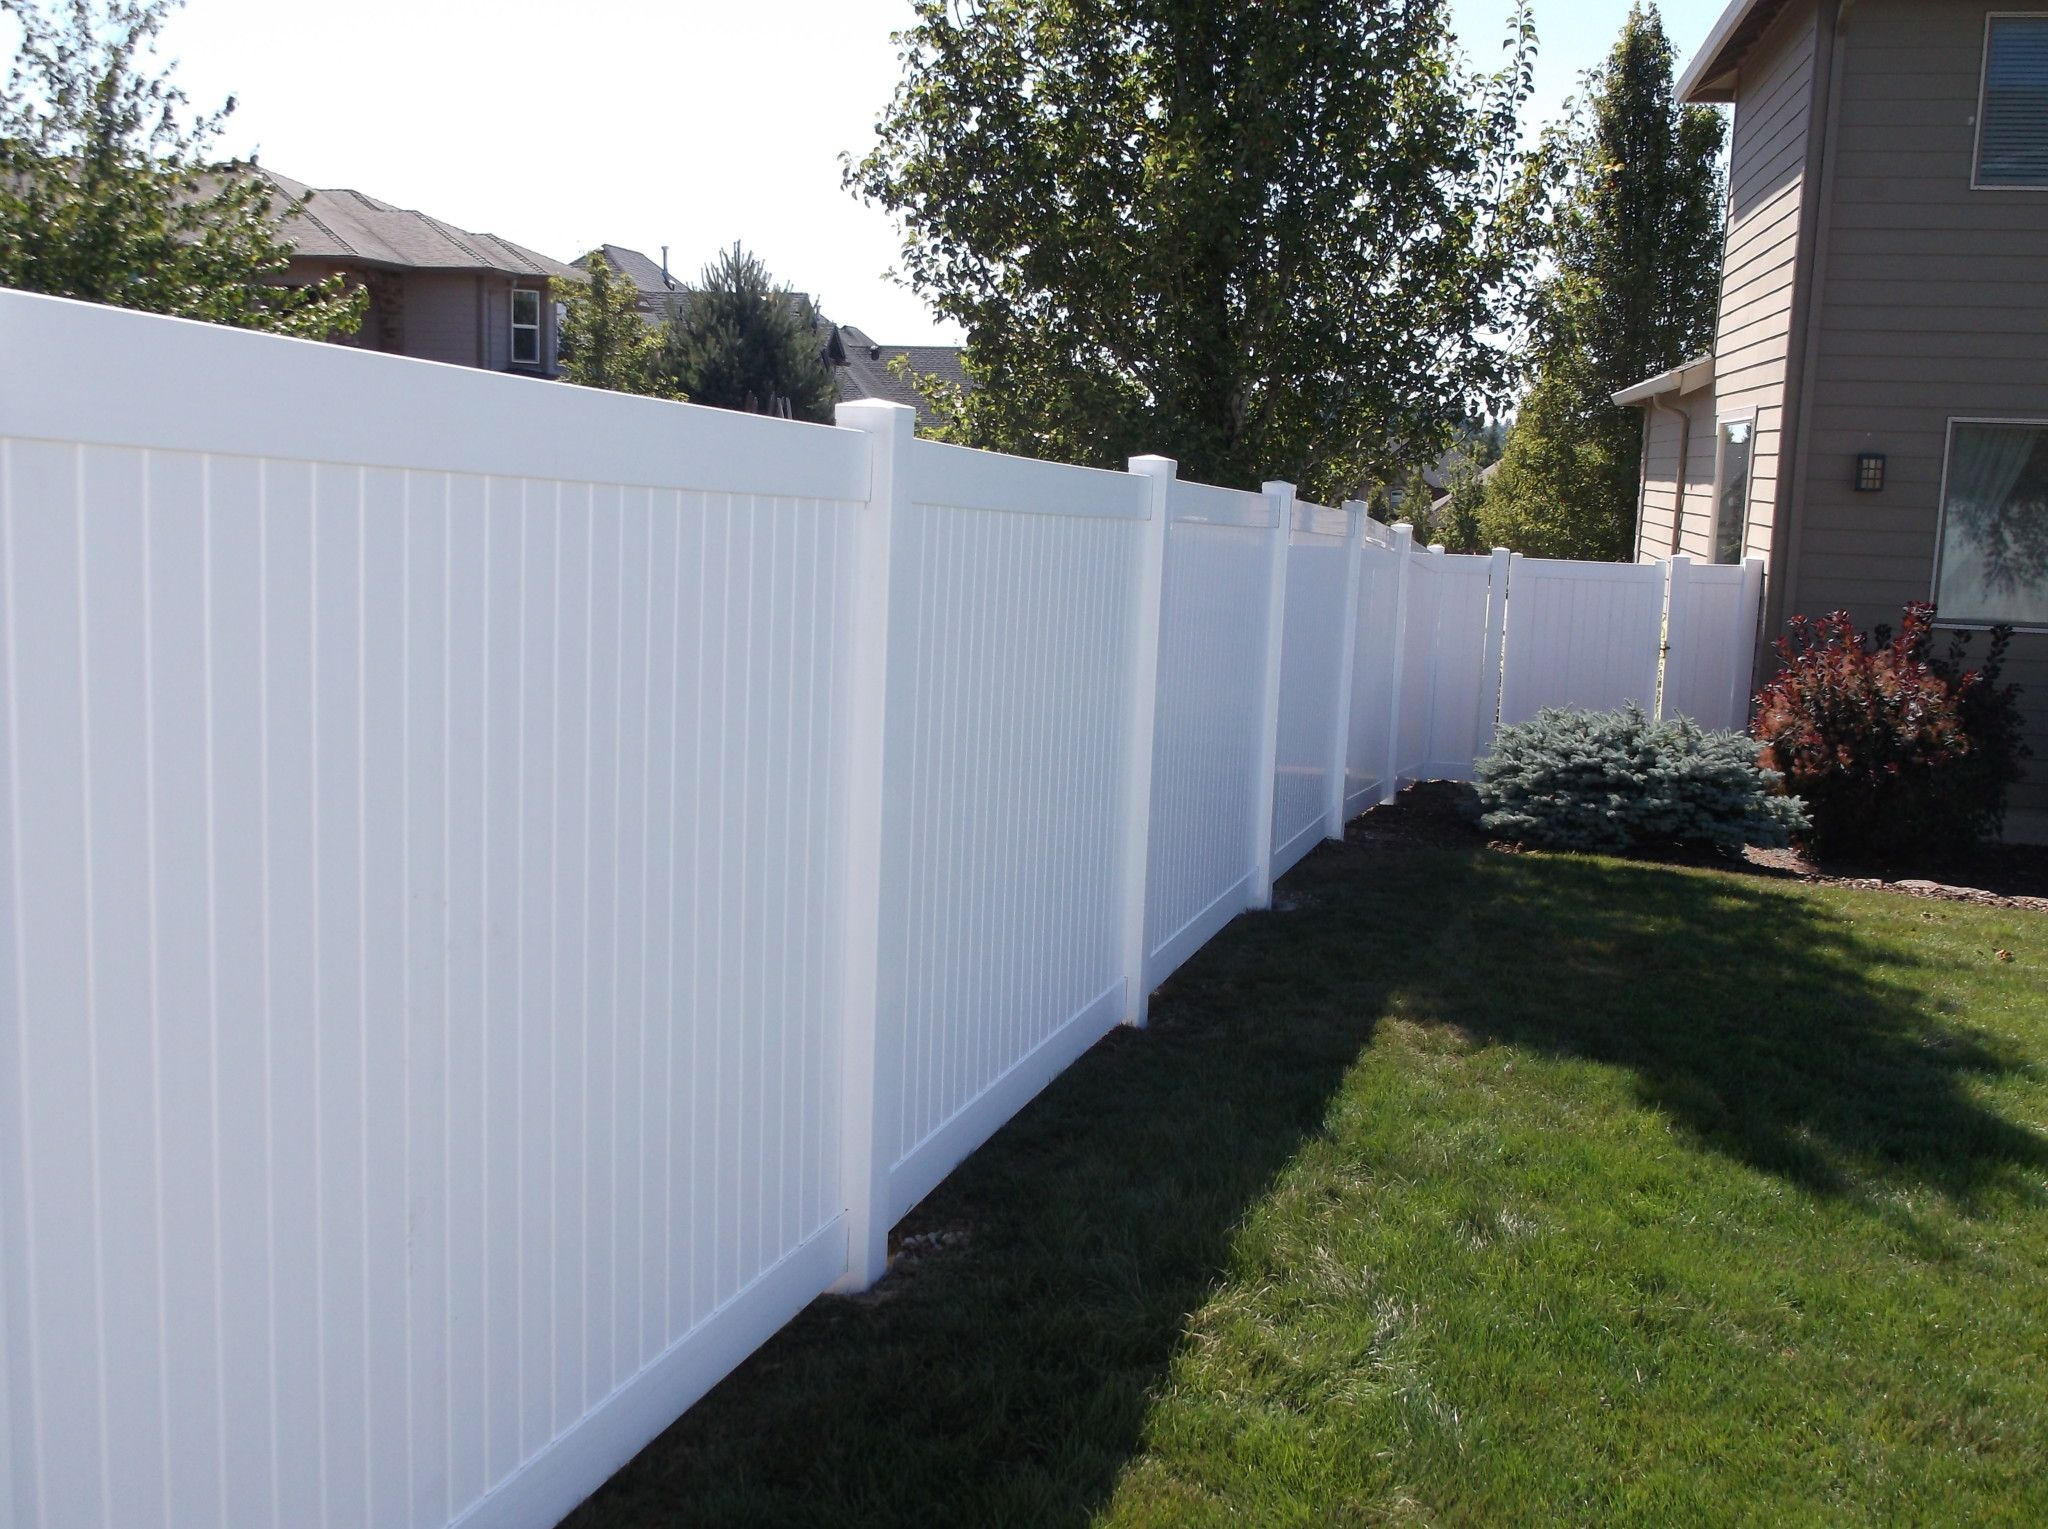 cheap fence panels for sale Cheap PVC & WPC Fence